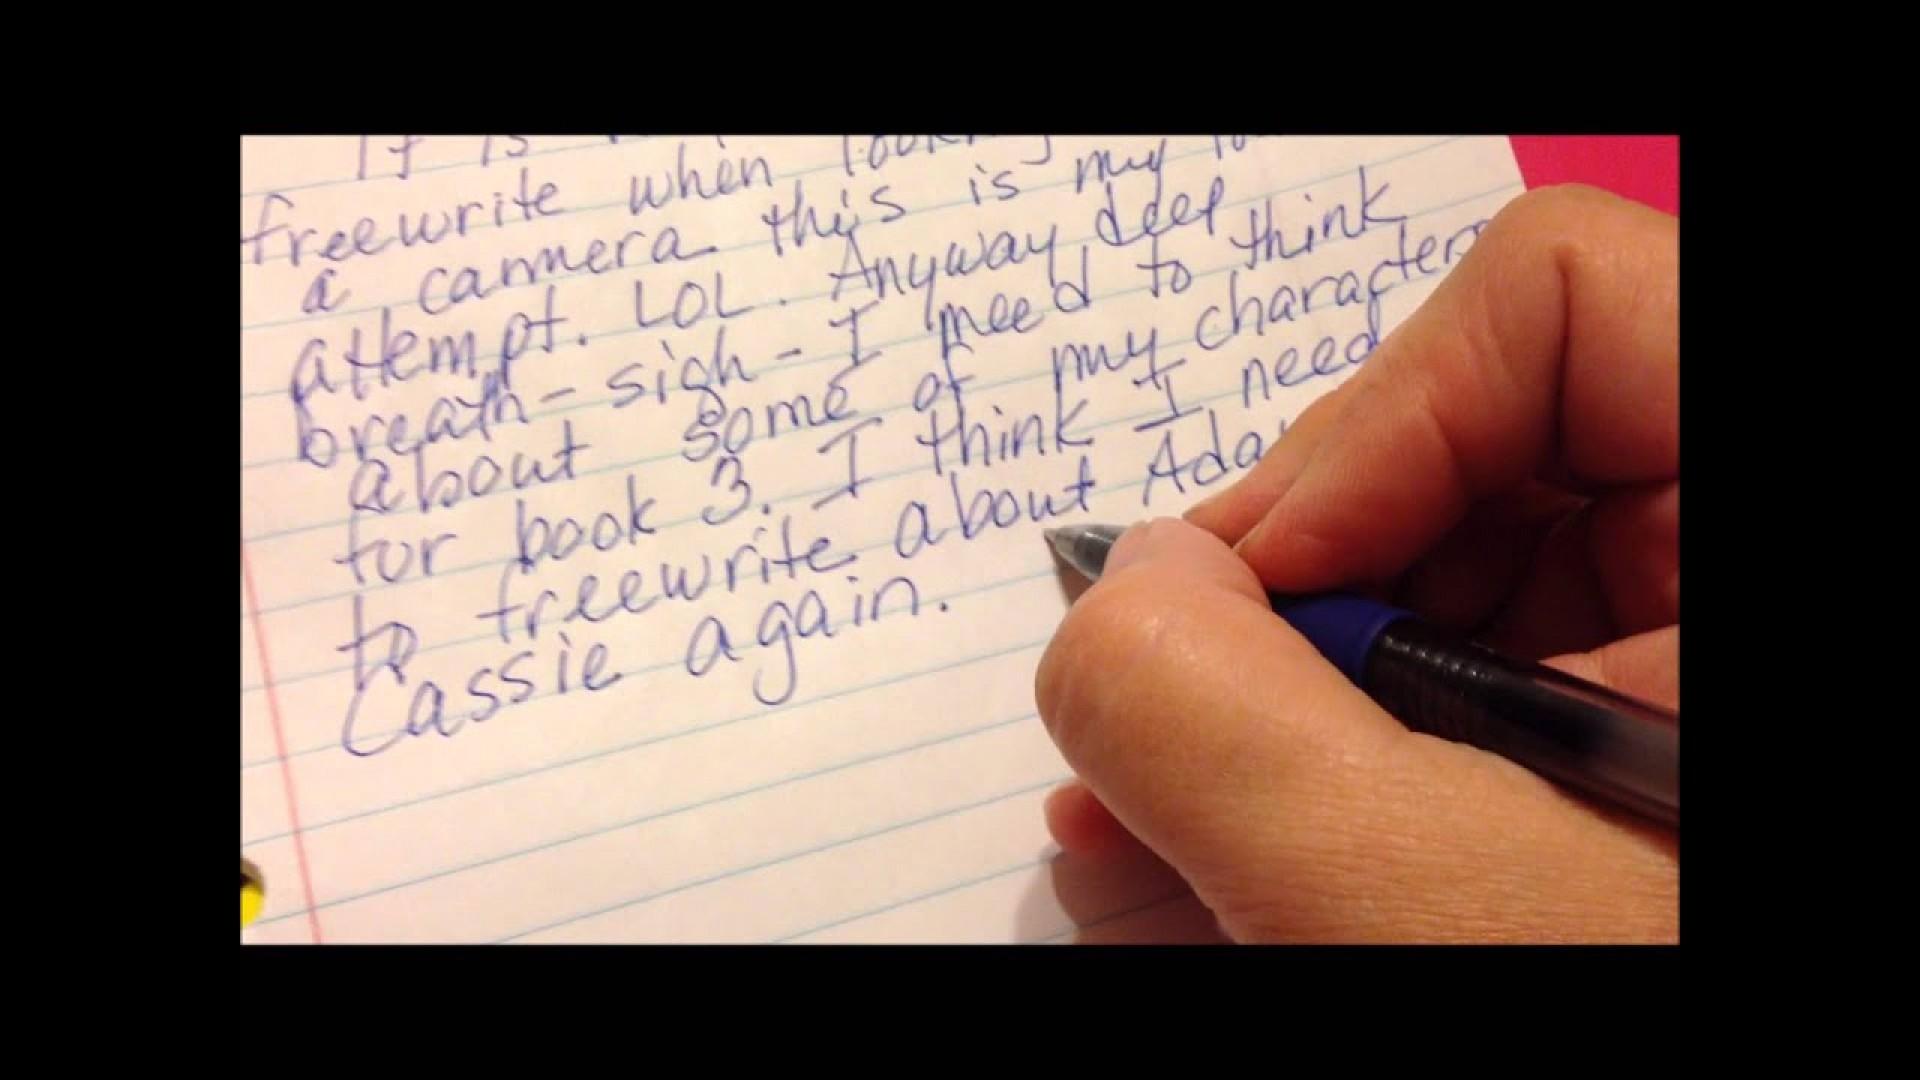 018 Maxresdefault Essay Checker Free Online Amazing Sentence Grammar Plagiarism Document 1920